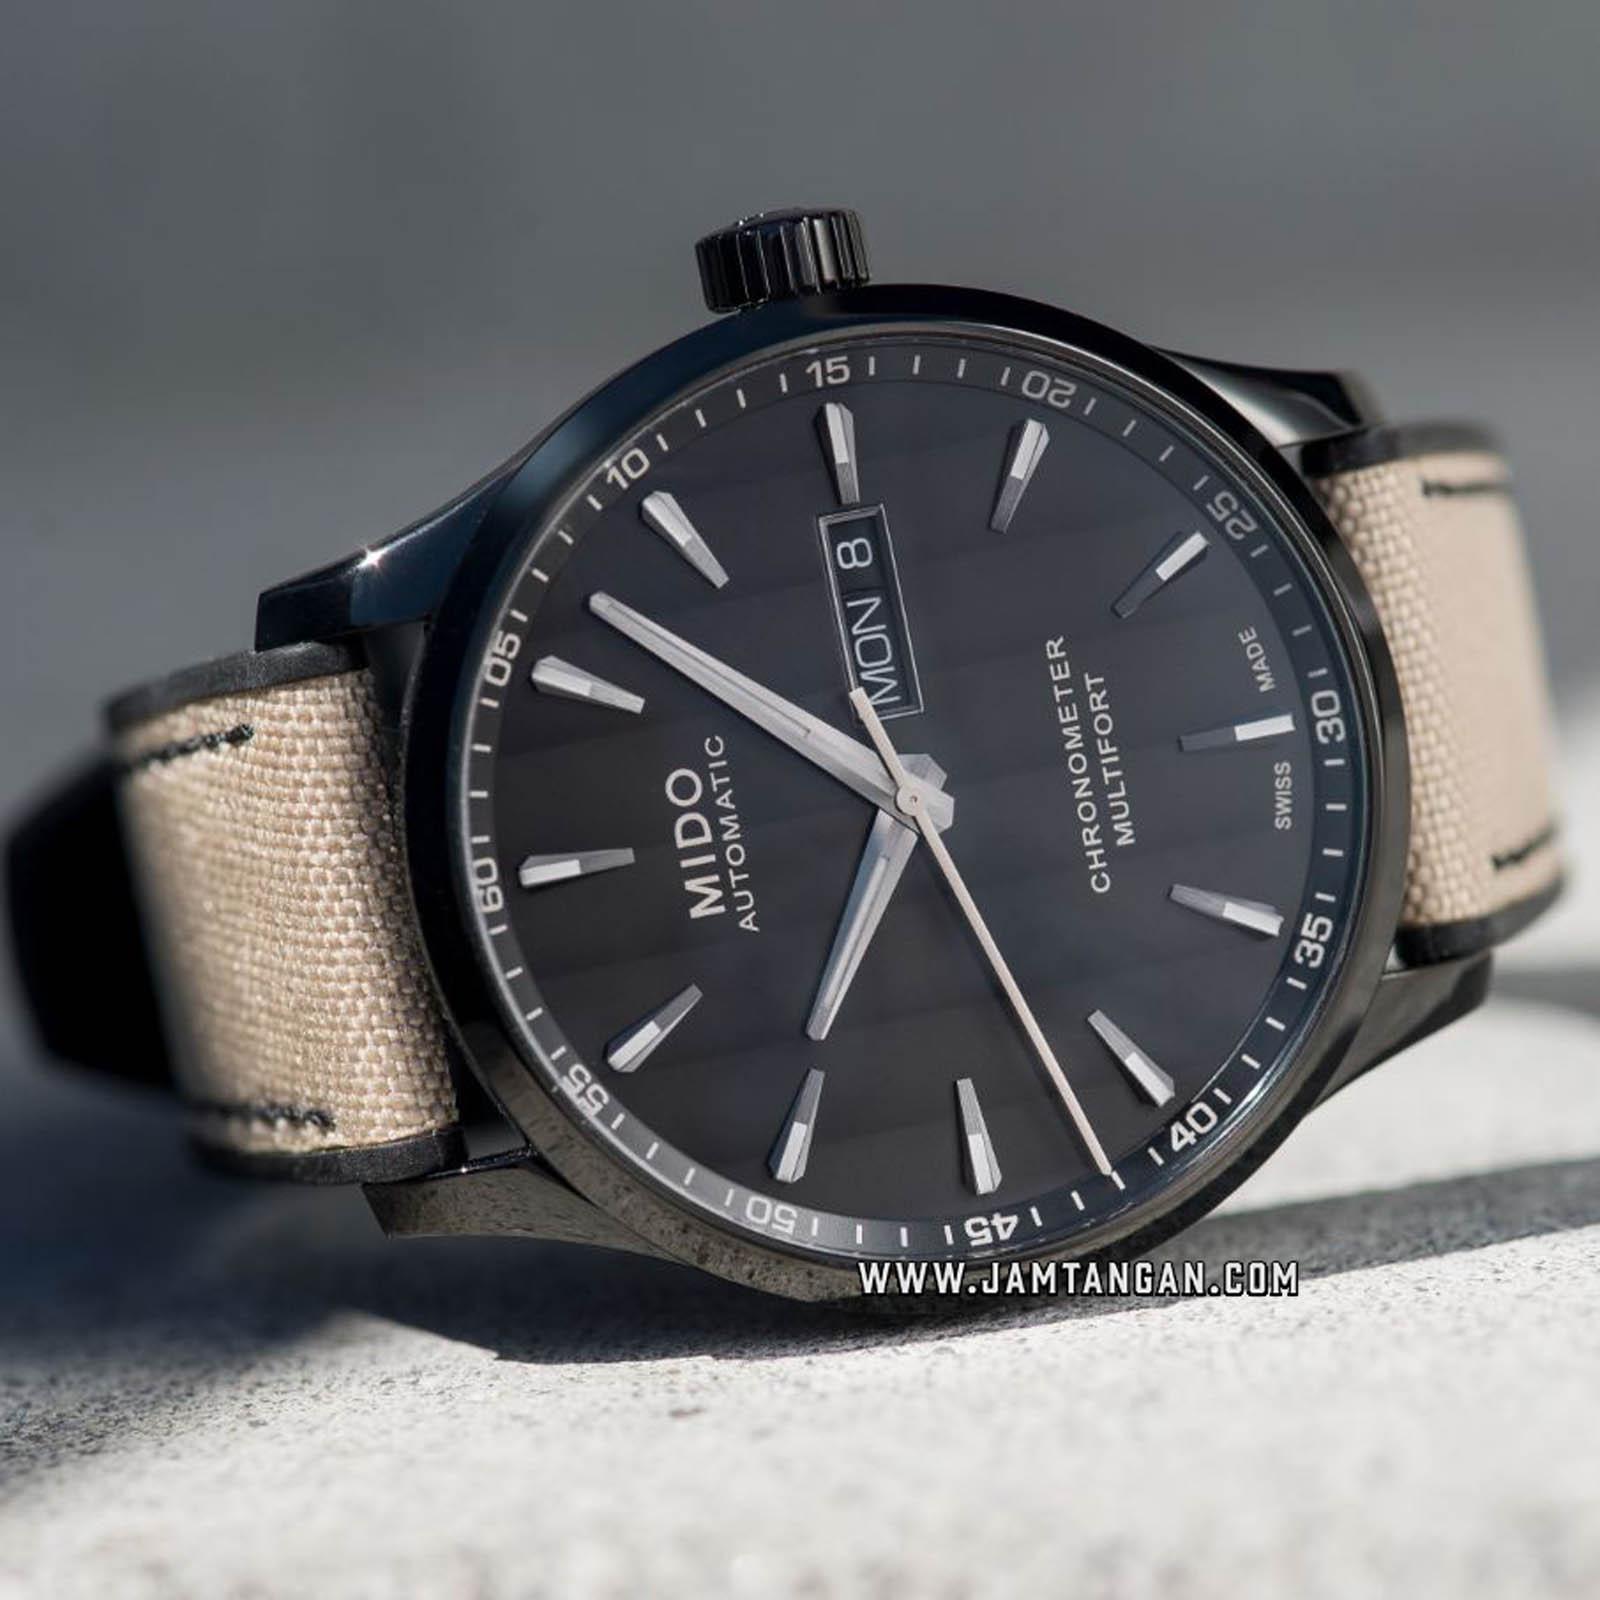 Mido M038.431.37.051.09 Multifort Chronometer Automatic Black Dial Biege Fabric Strap Machtwatch